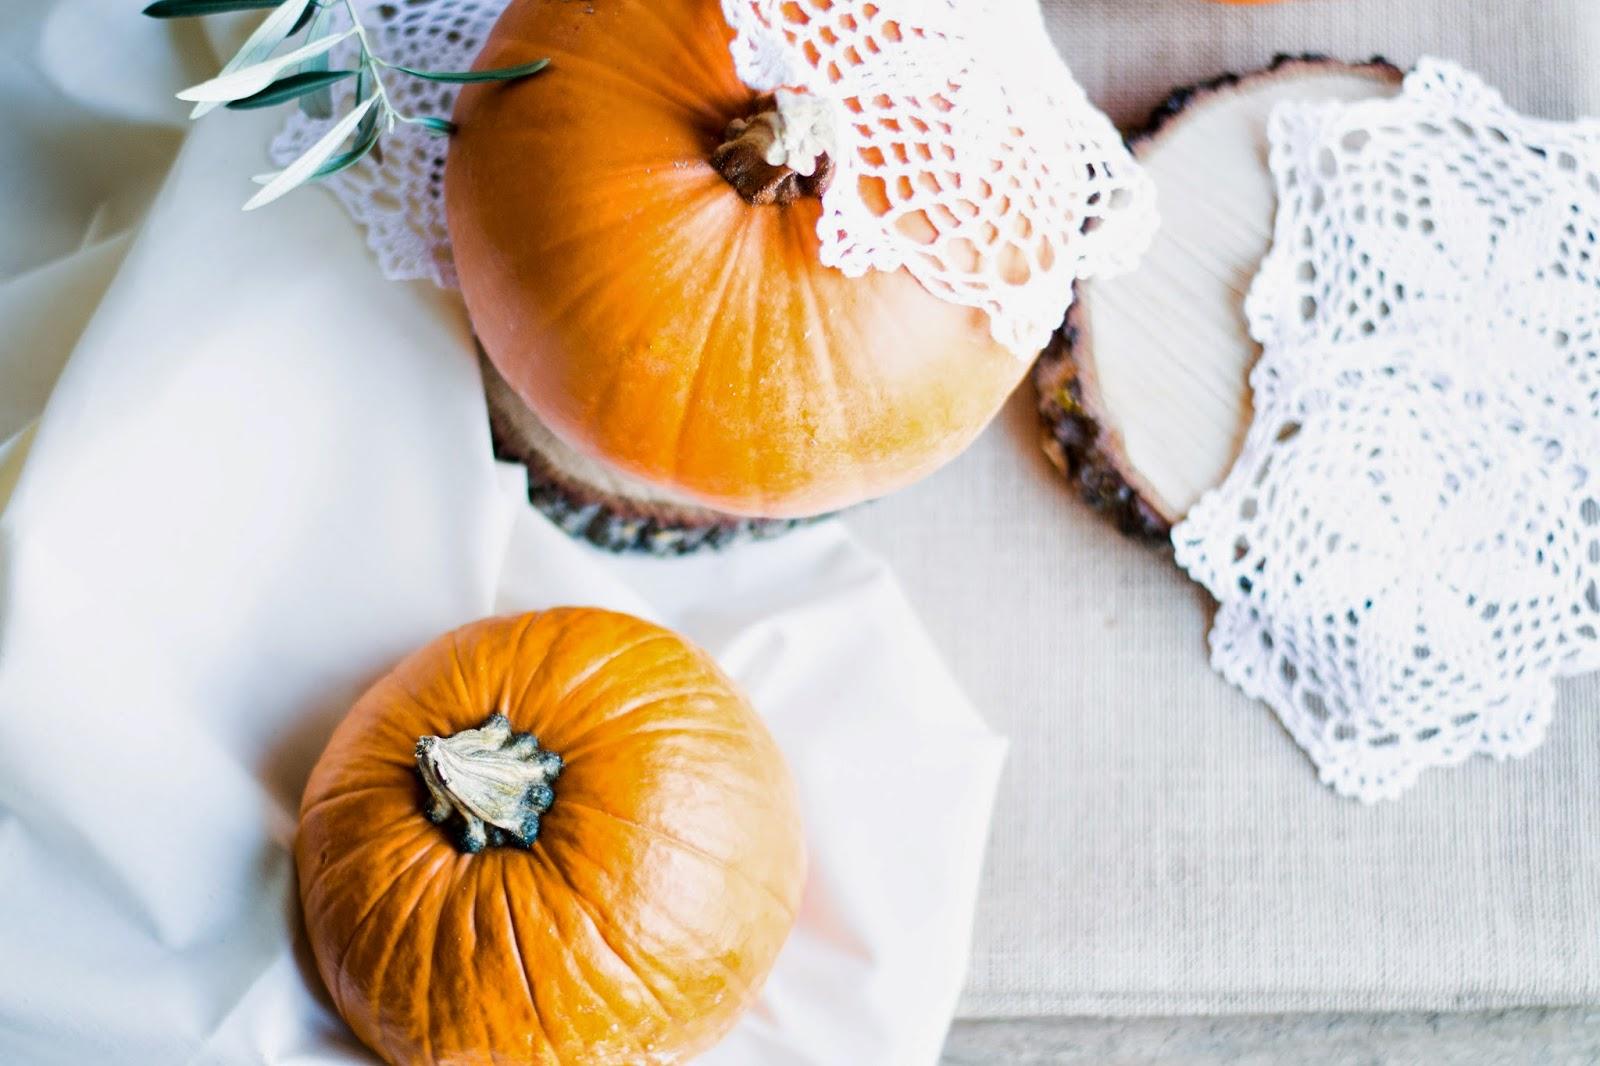 Decoración de Halloween con calabazas